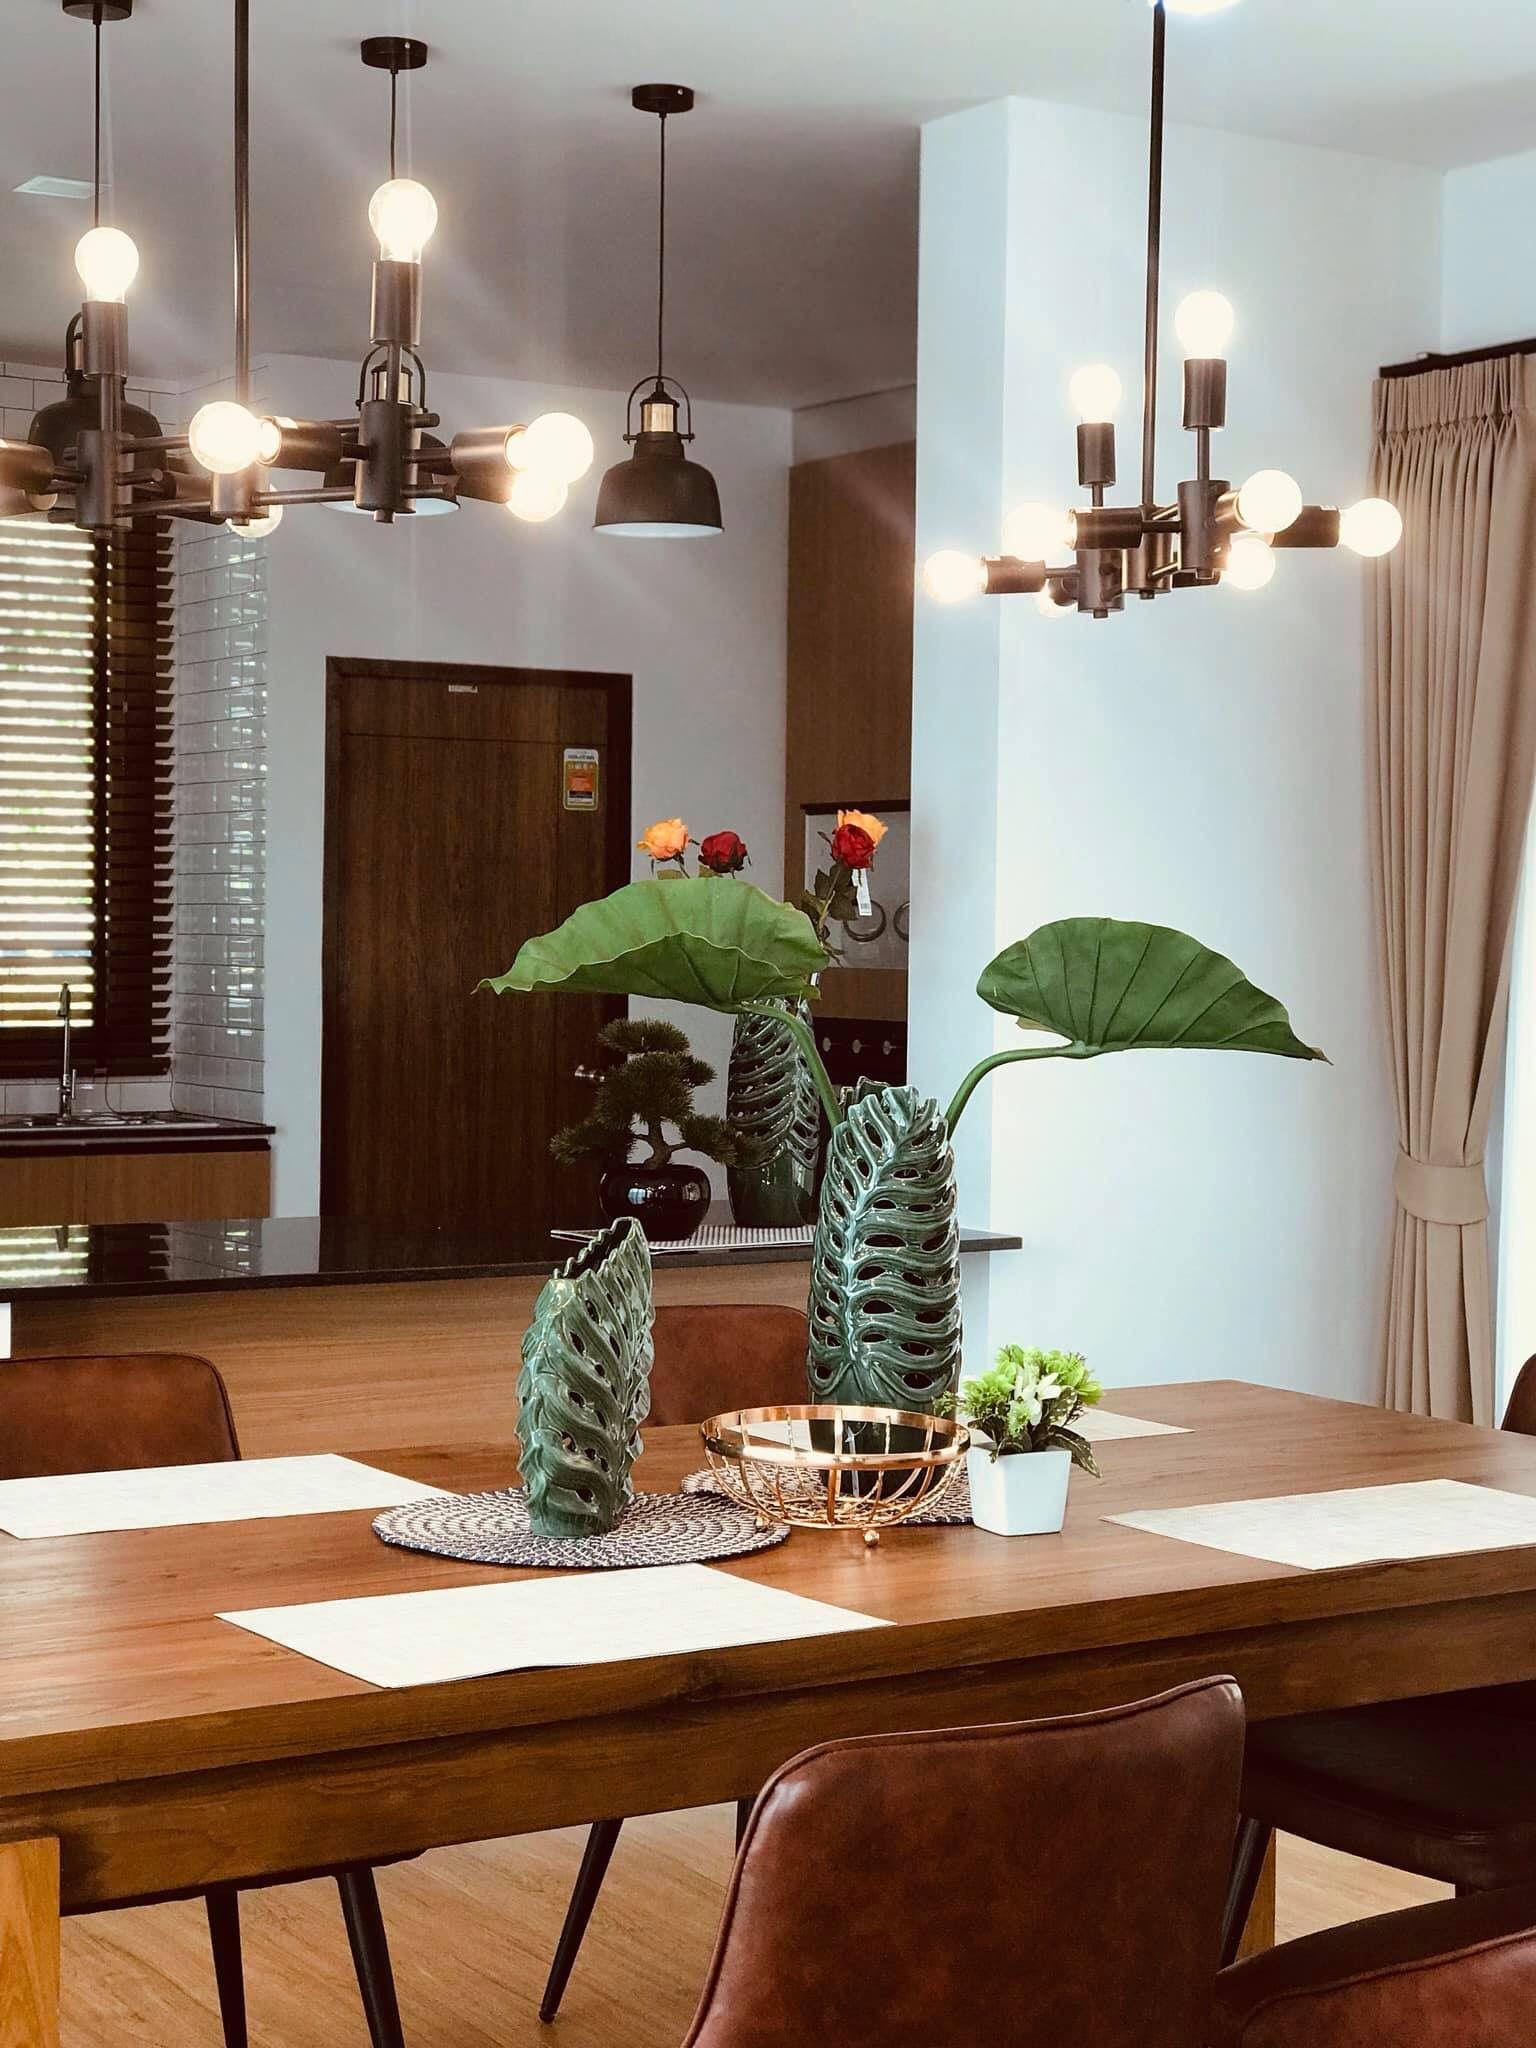 Home Lightings Interior Ideas In 2019 Lighting